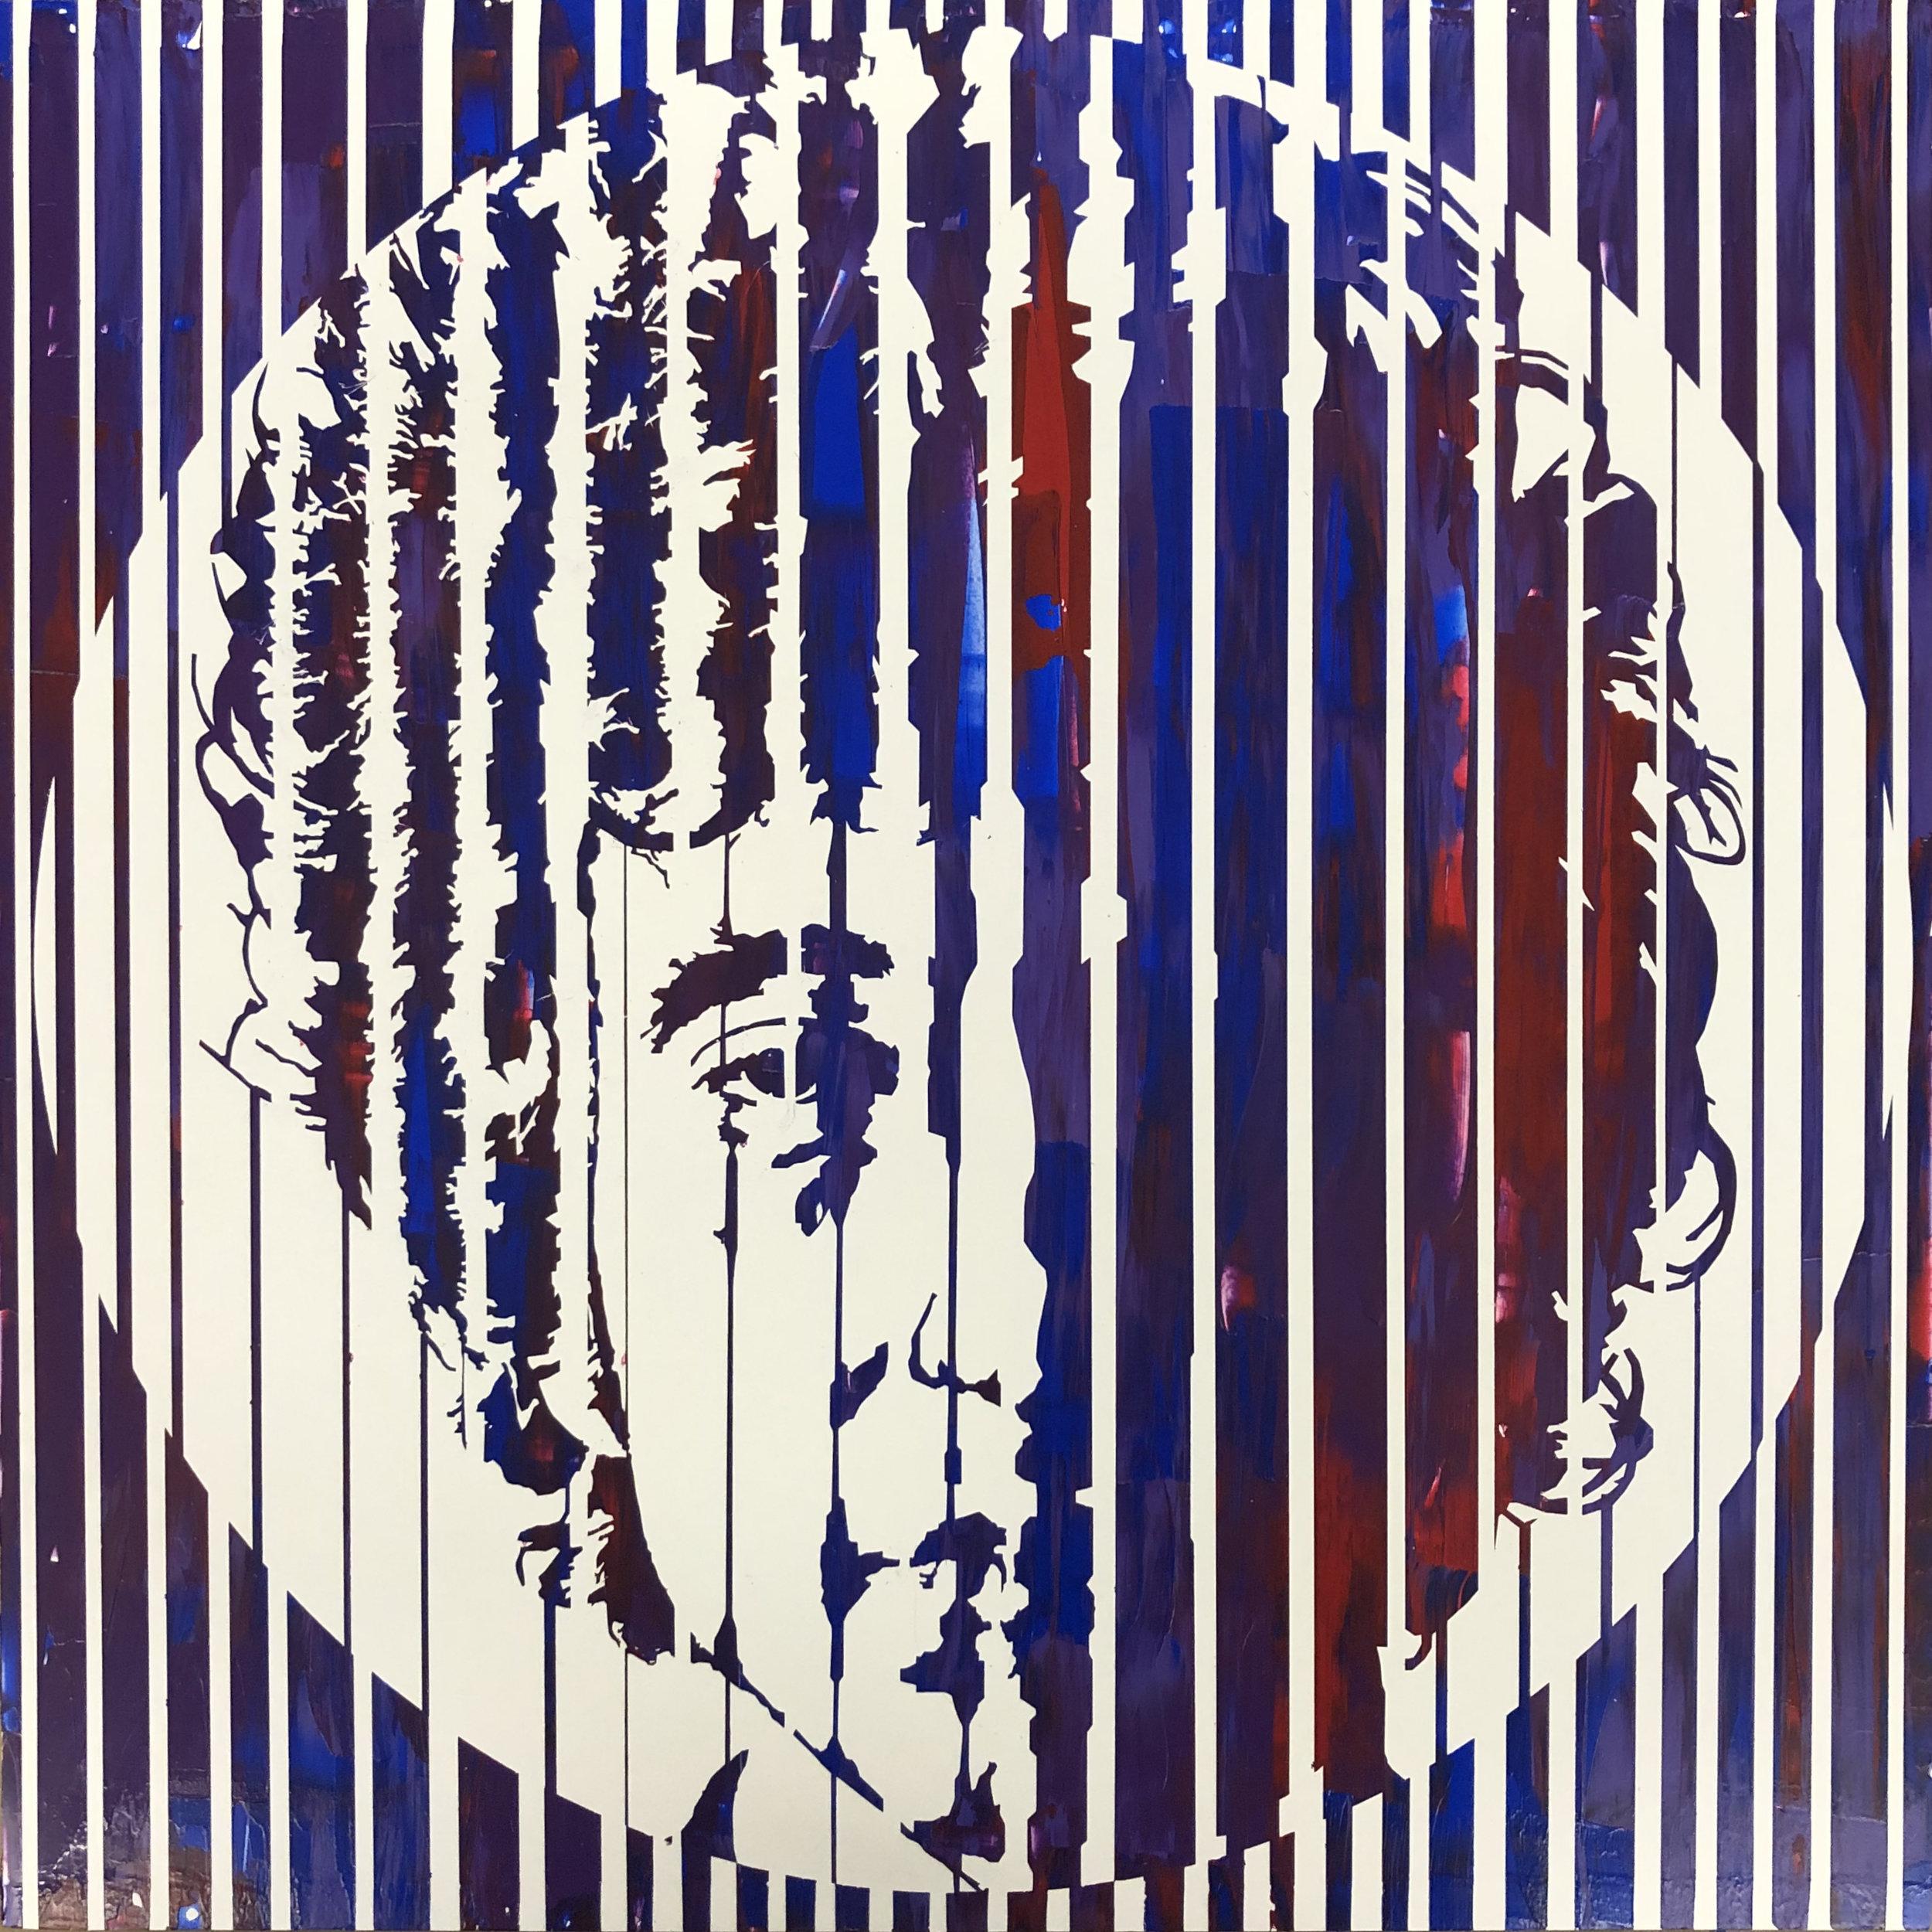 Sean Christopher Ward - Dylan VI - Acrylic on Wood Panel - 16x16x1.5 - 2018 - 500.jpg